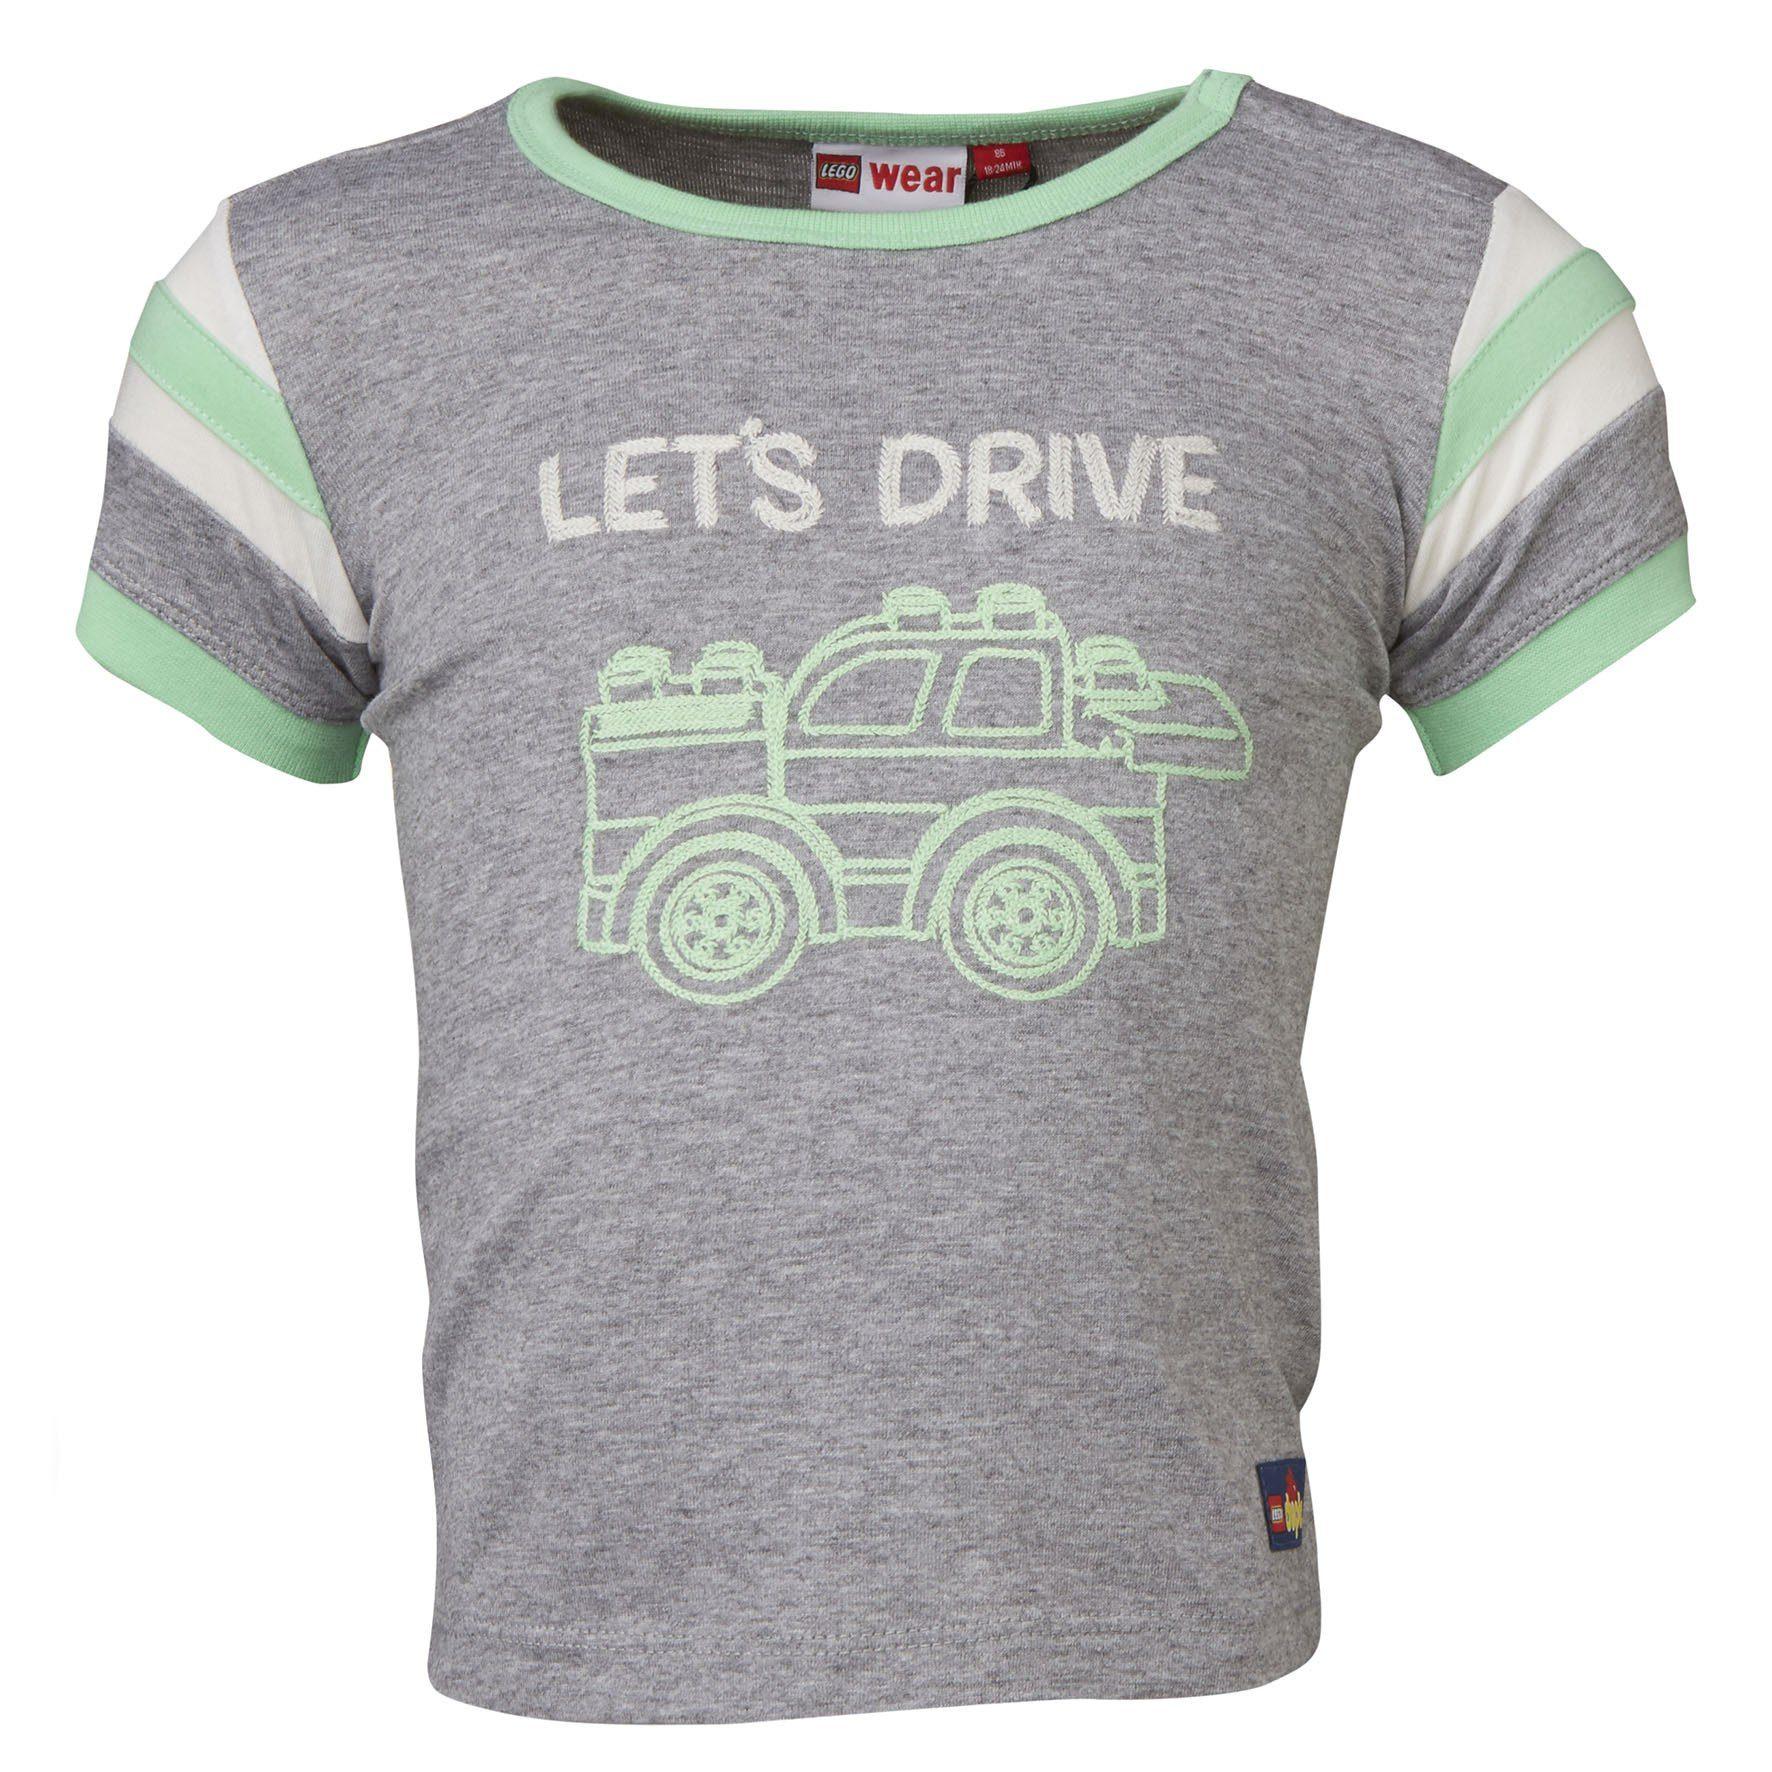 "LEGO Wear Duplo T-Shirt ""Lets Drive"" kurzarm Shirt Trey"